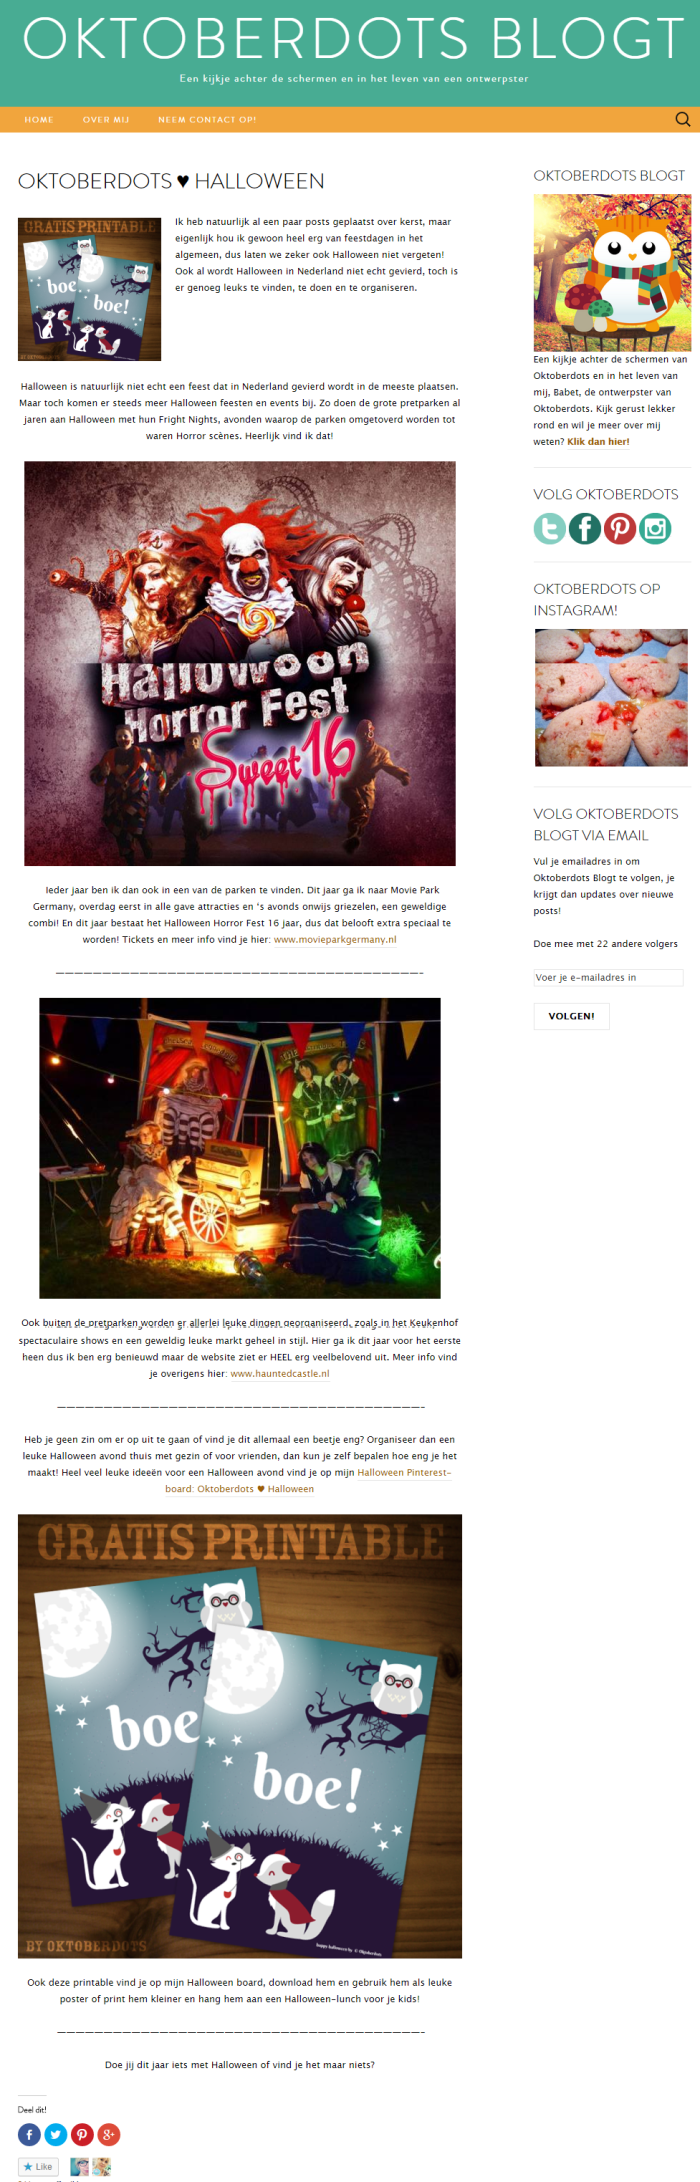 oktoberdots-halloween-blog